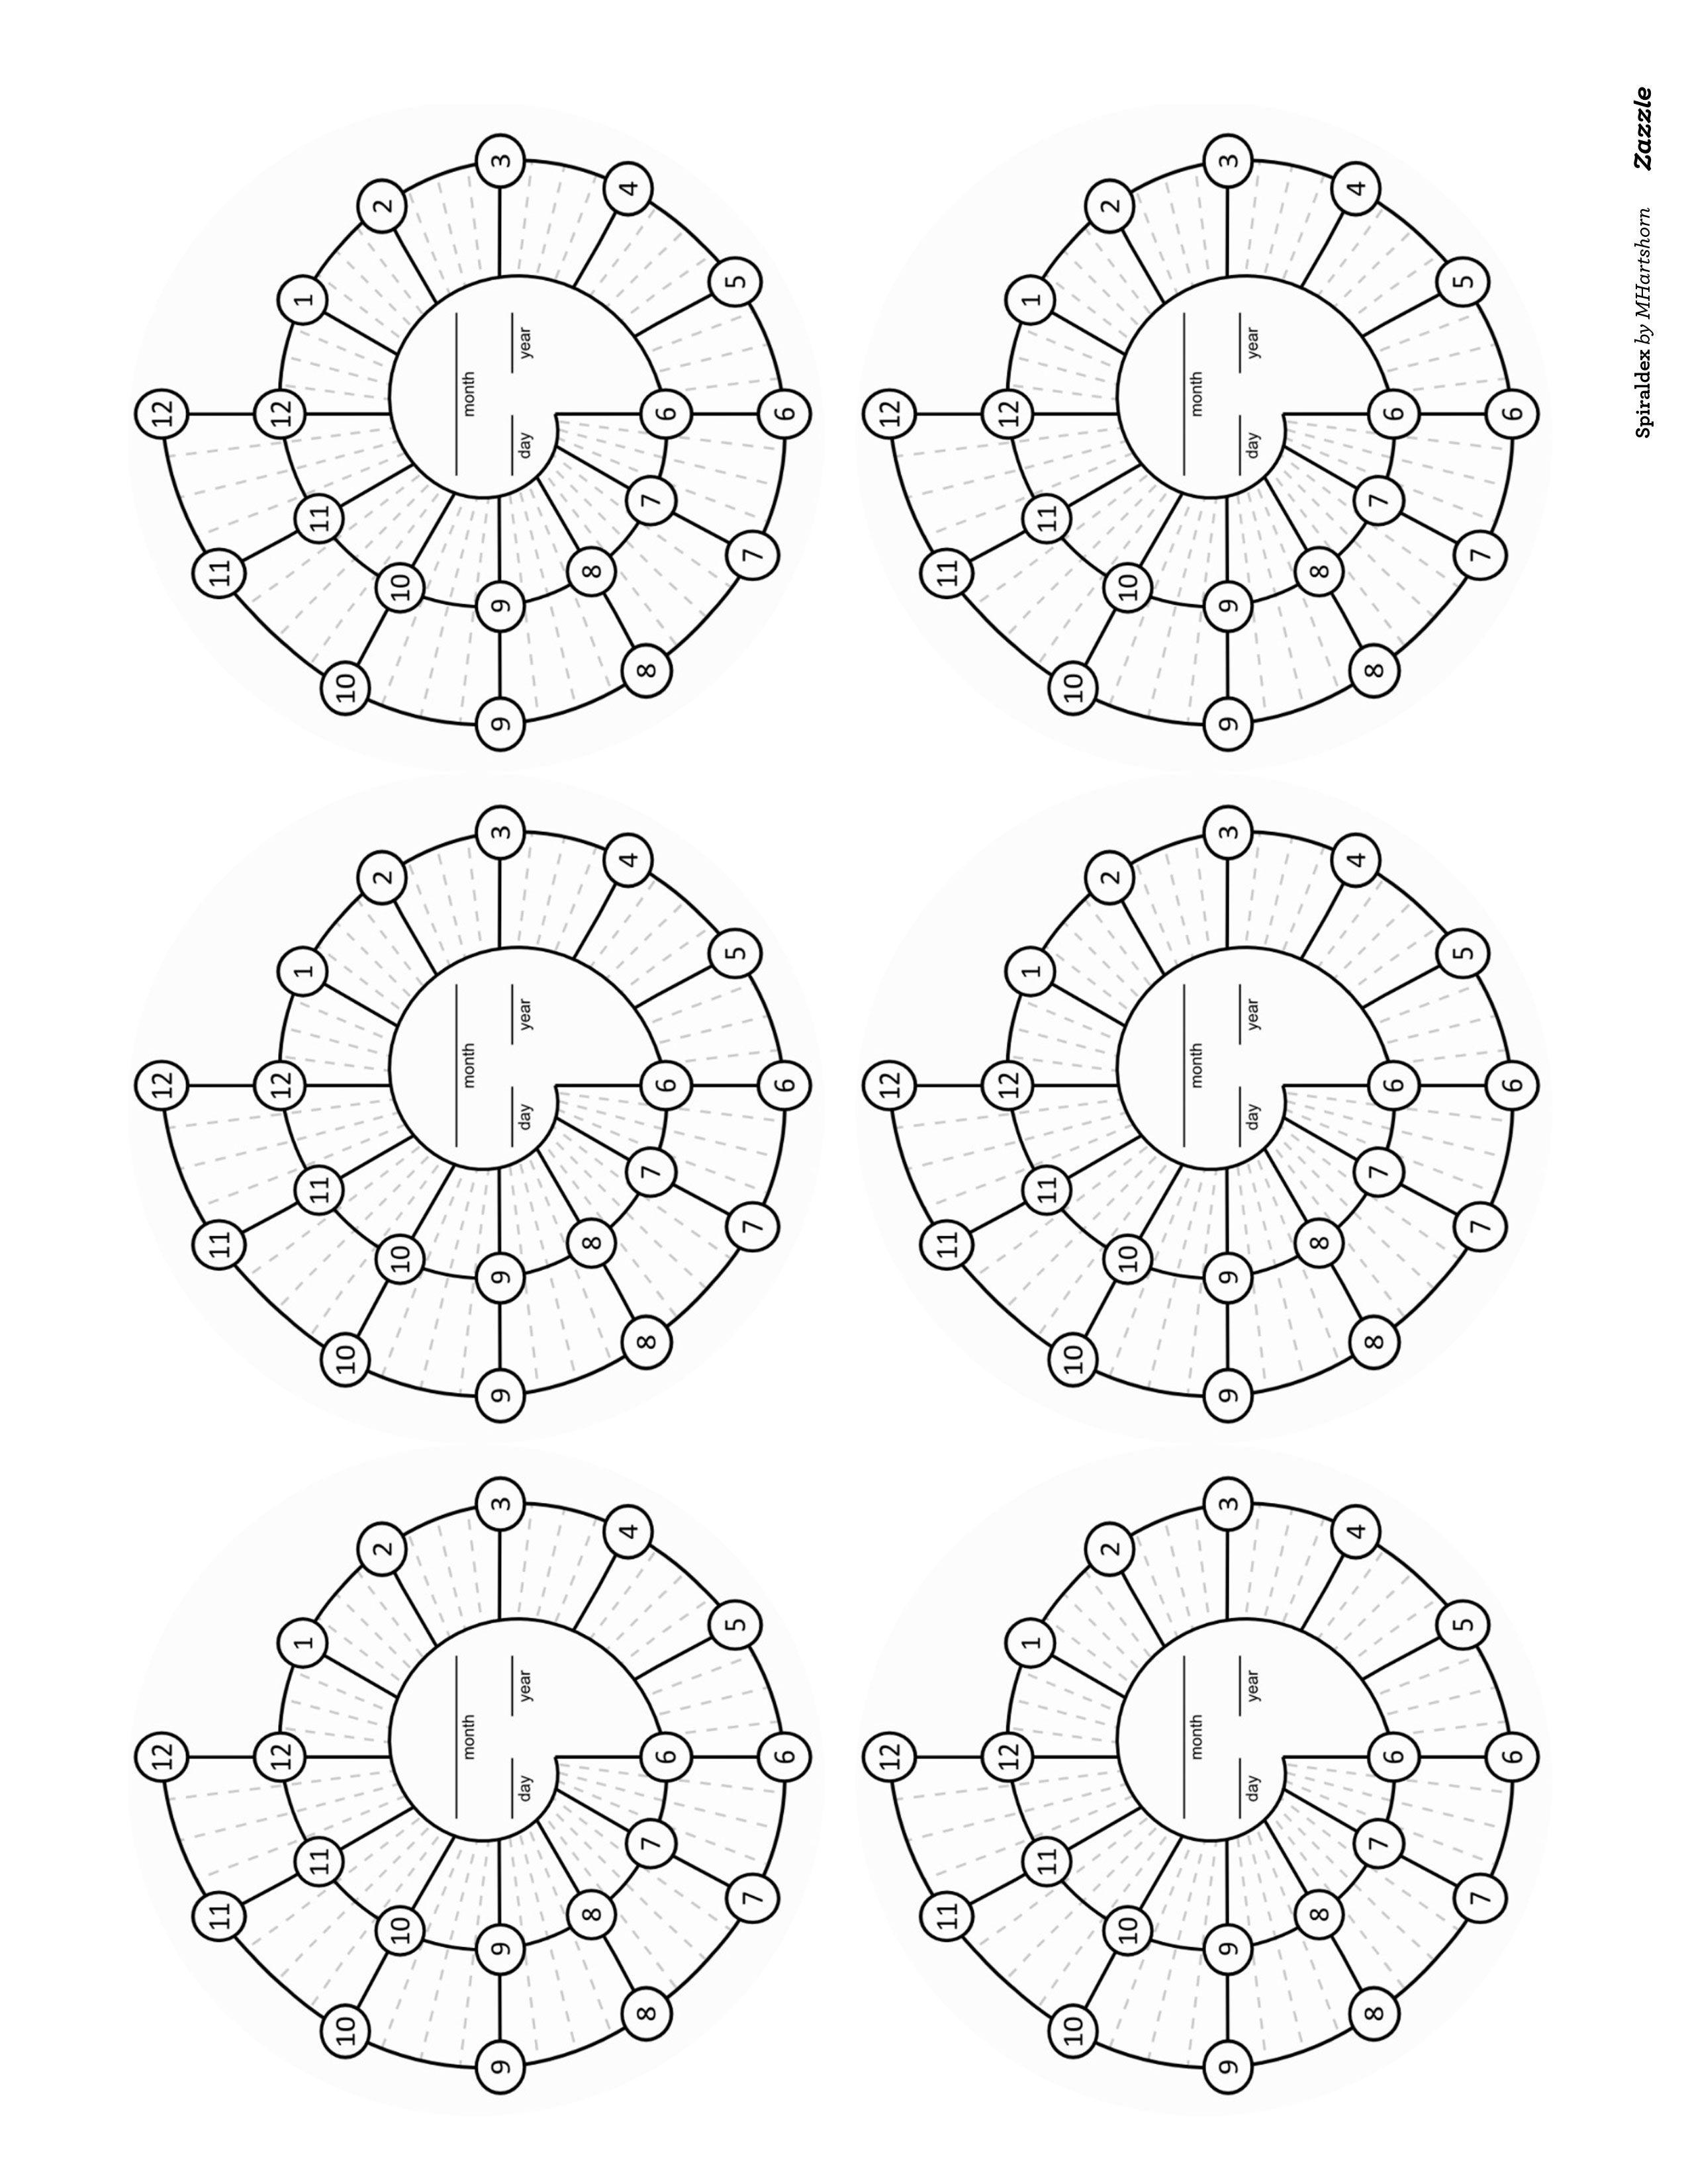 Spiraldex 2x3 array for print (8.5